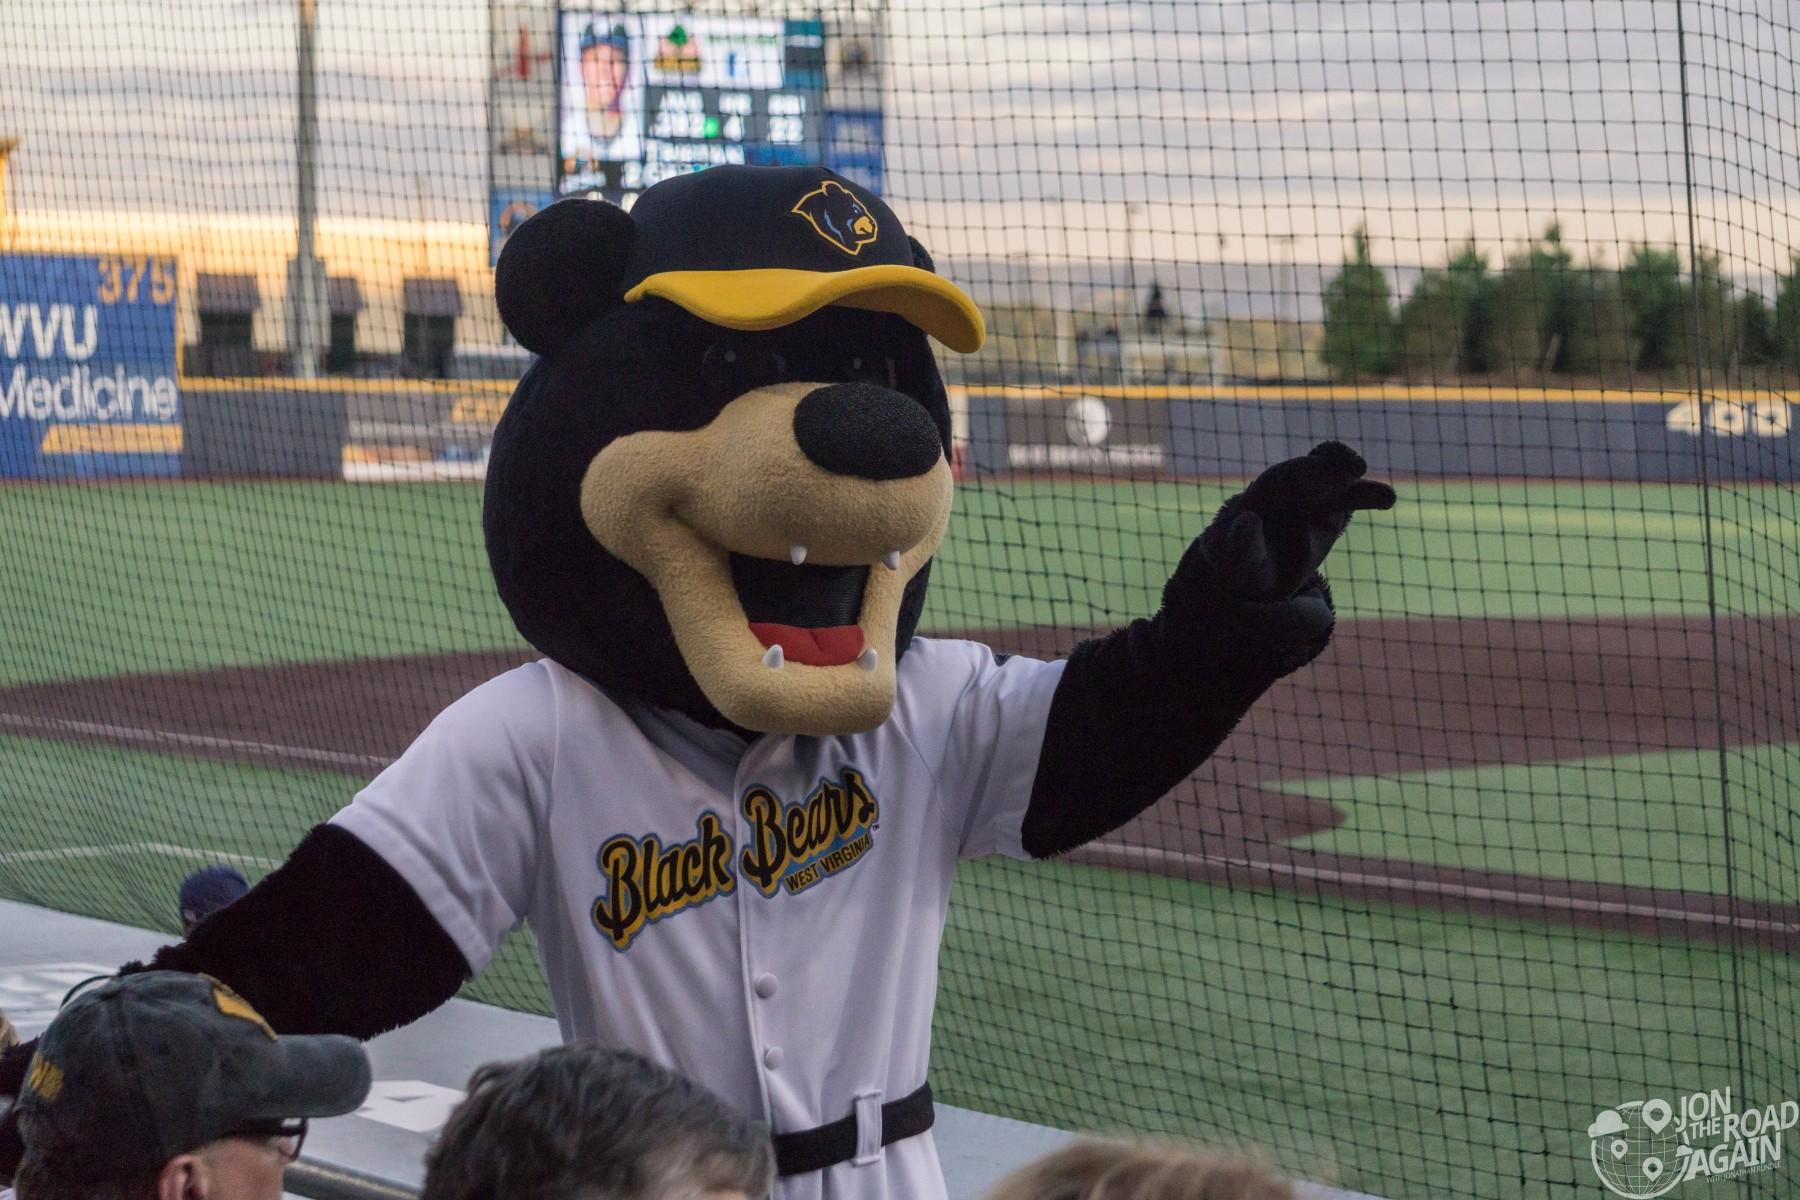 West Virginia Black Bears Mascot